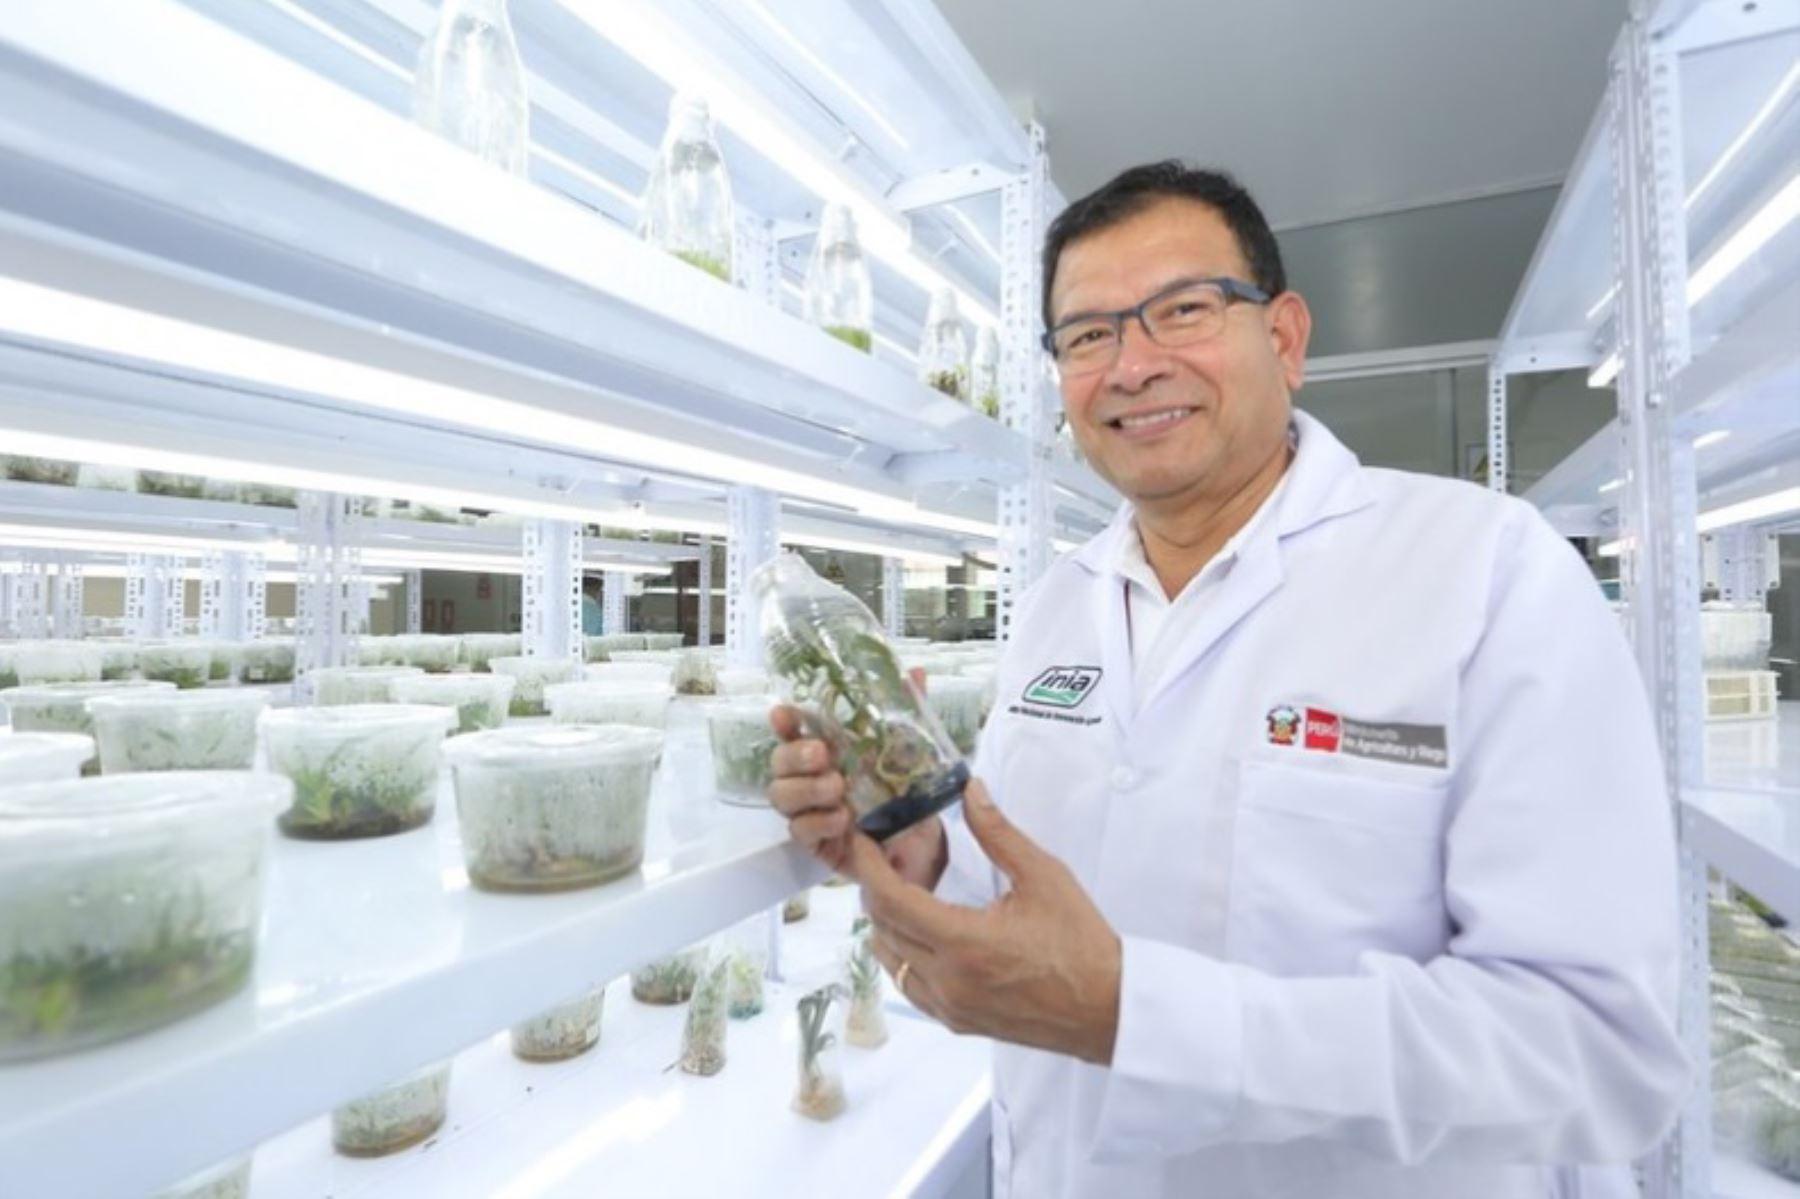 Ministro de Agricultura y Riego, Jorge Luis Montenegro. inaugura modernos laboratorios para potenciar producción agraria amazónica